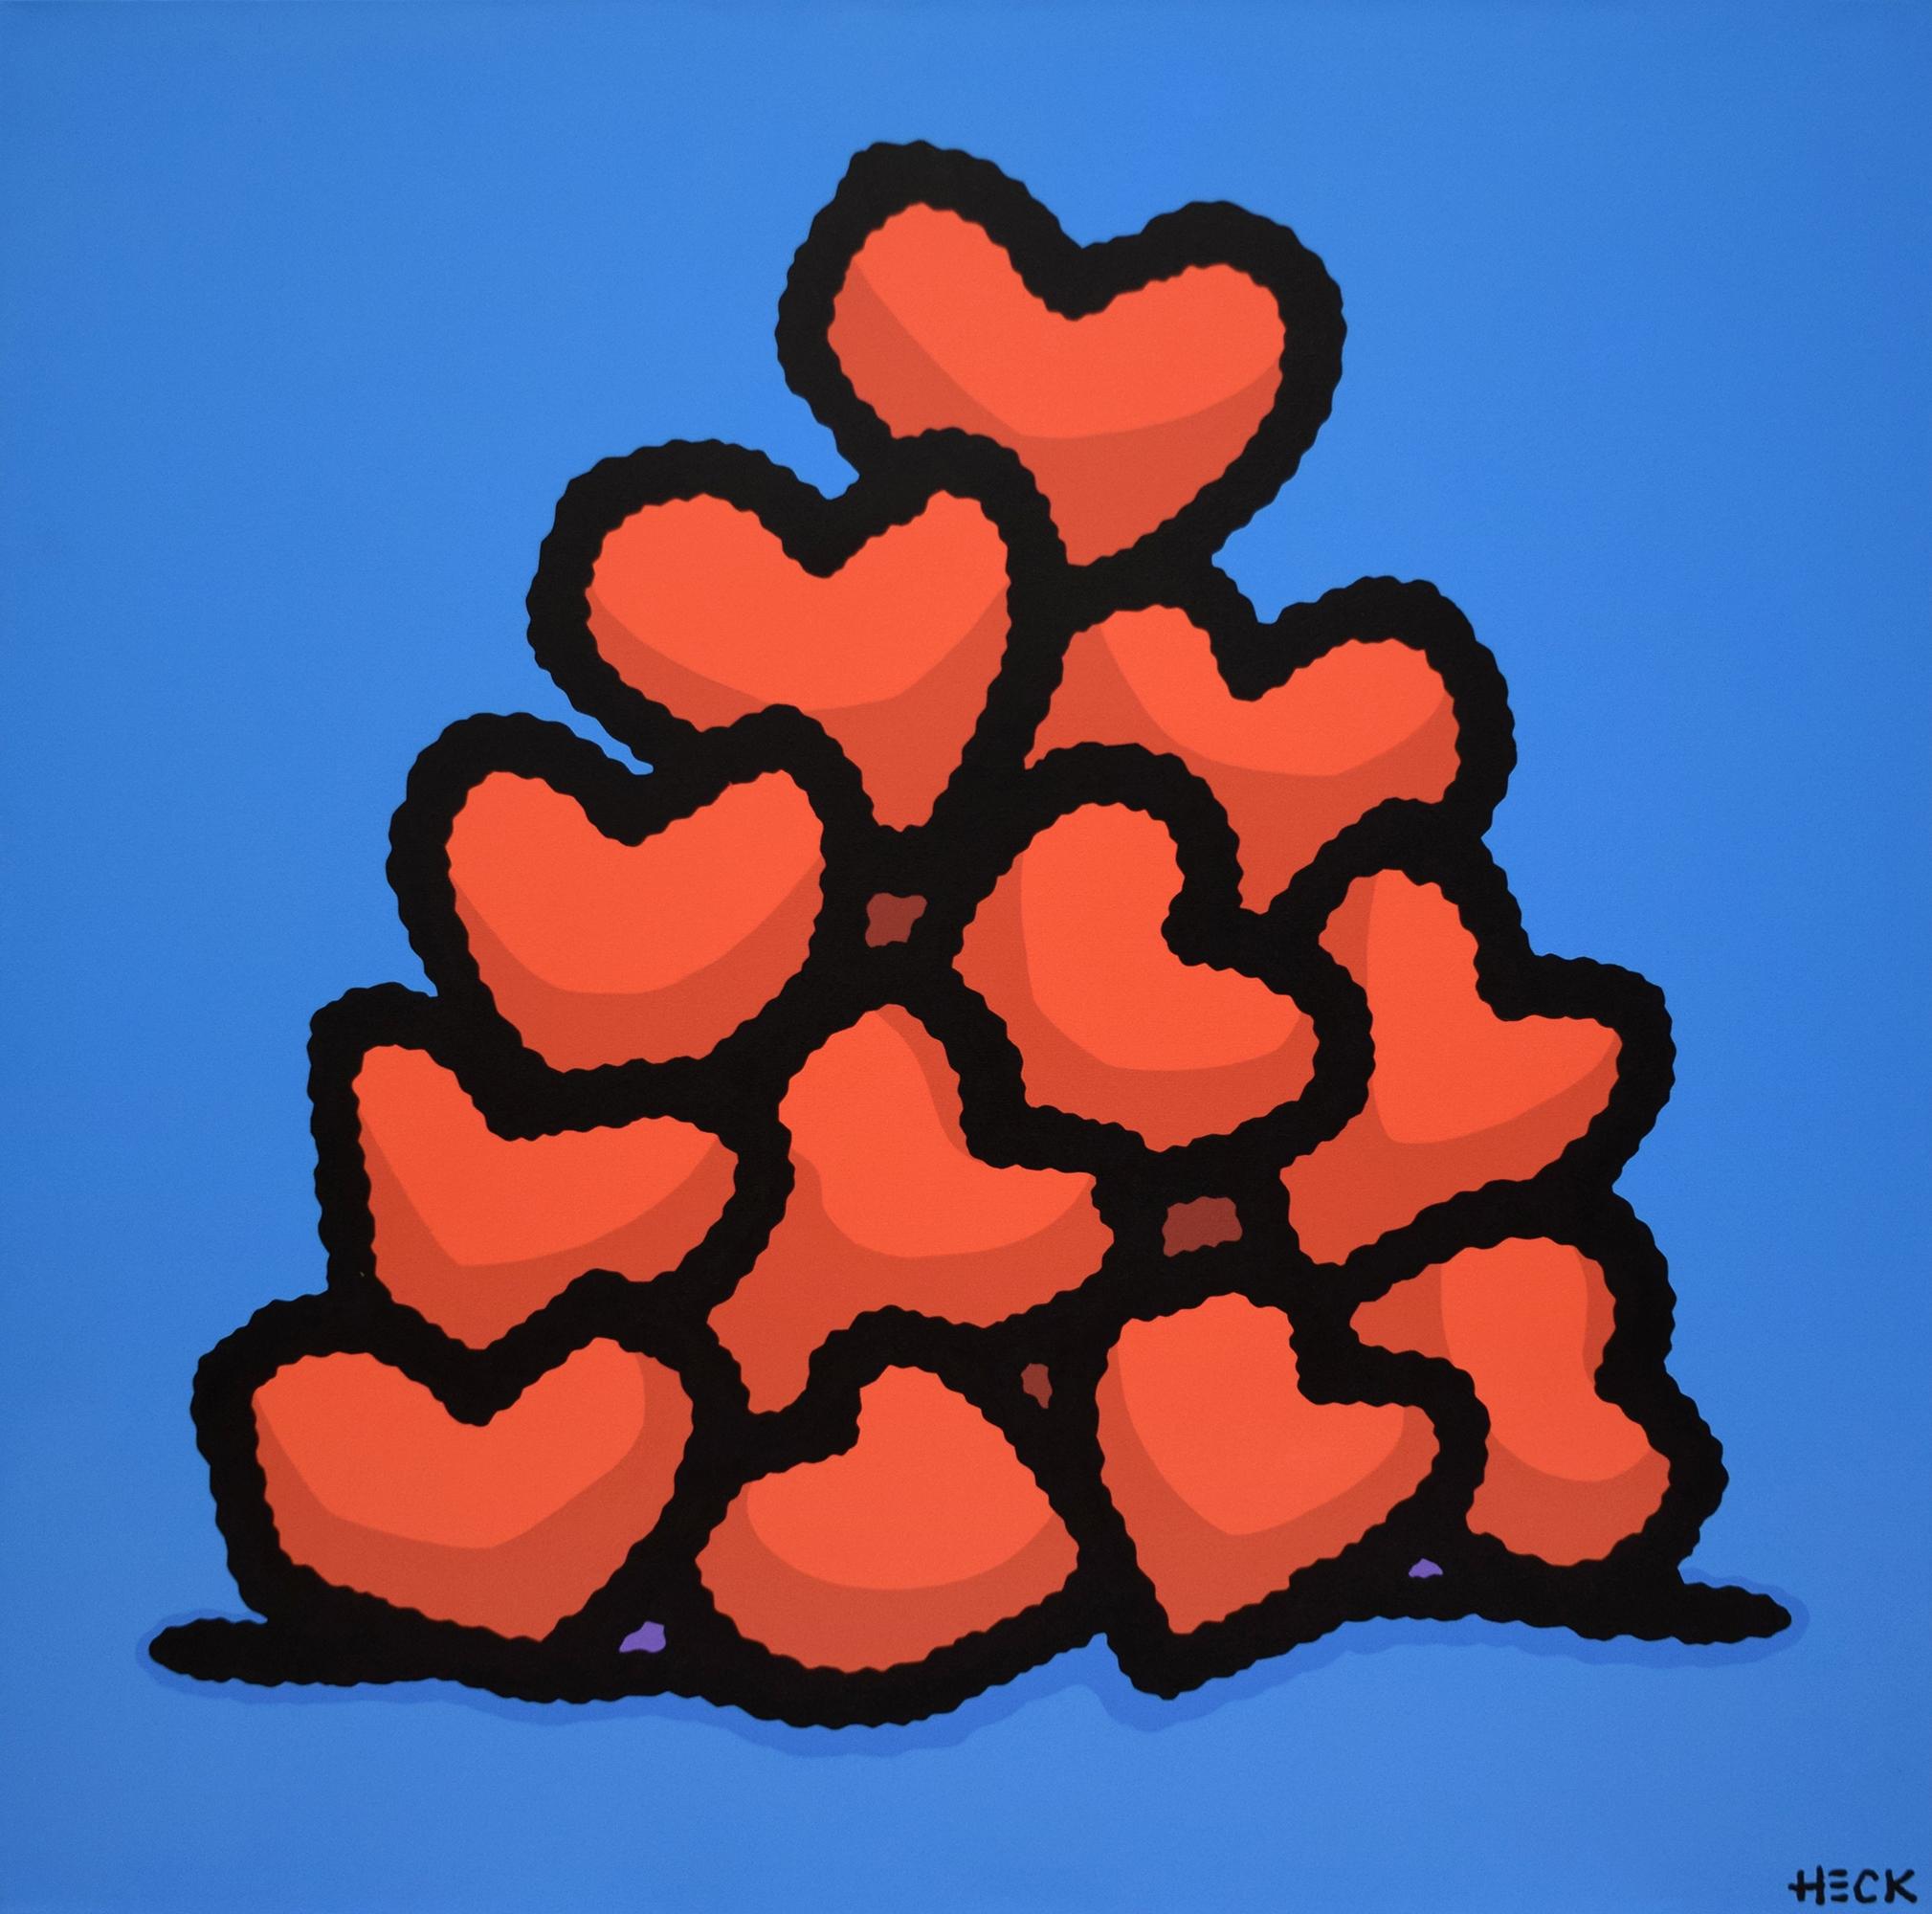 Ed Heck - Heart Pile , 6575-012-034